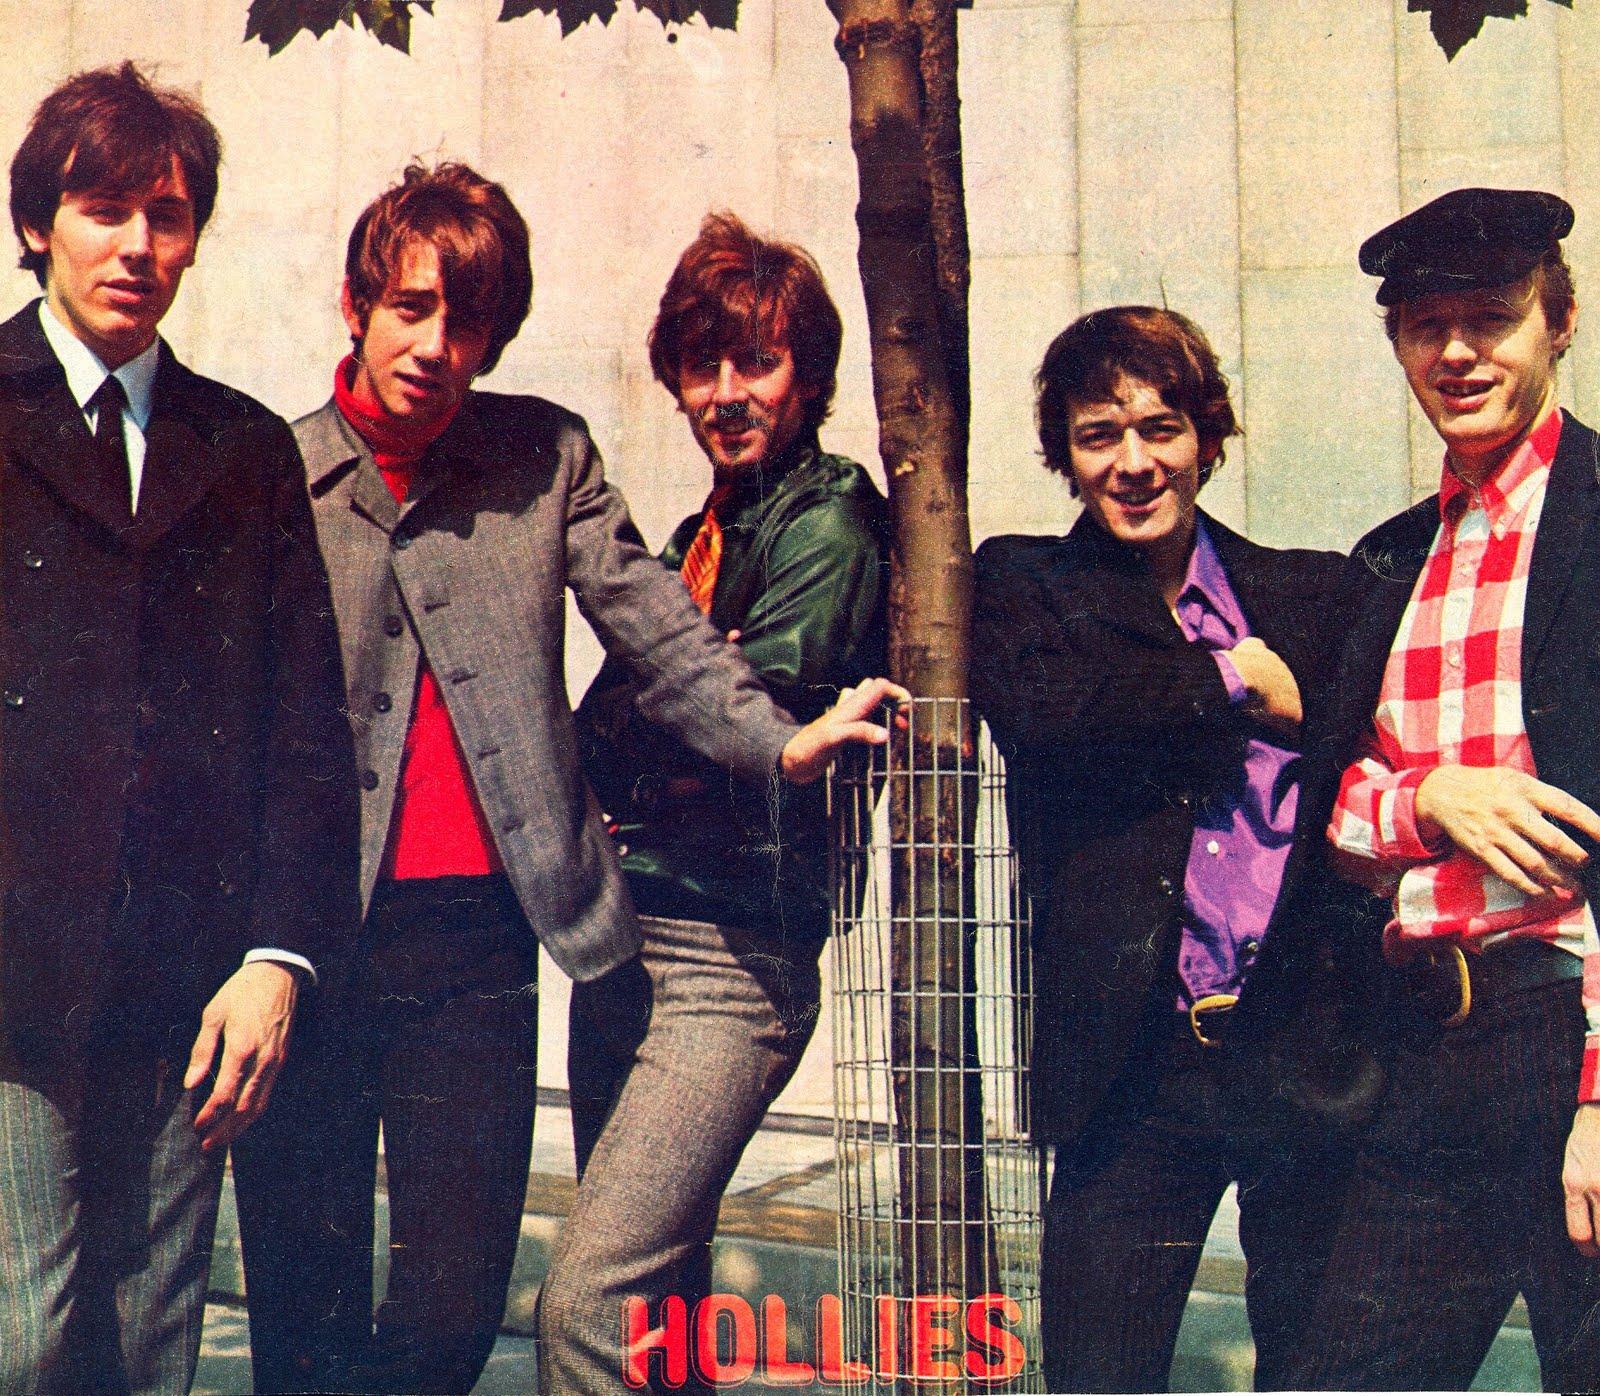 Hollies SB 963_1